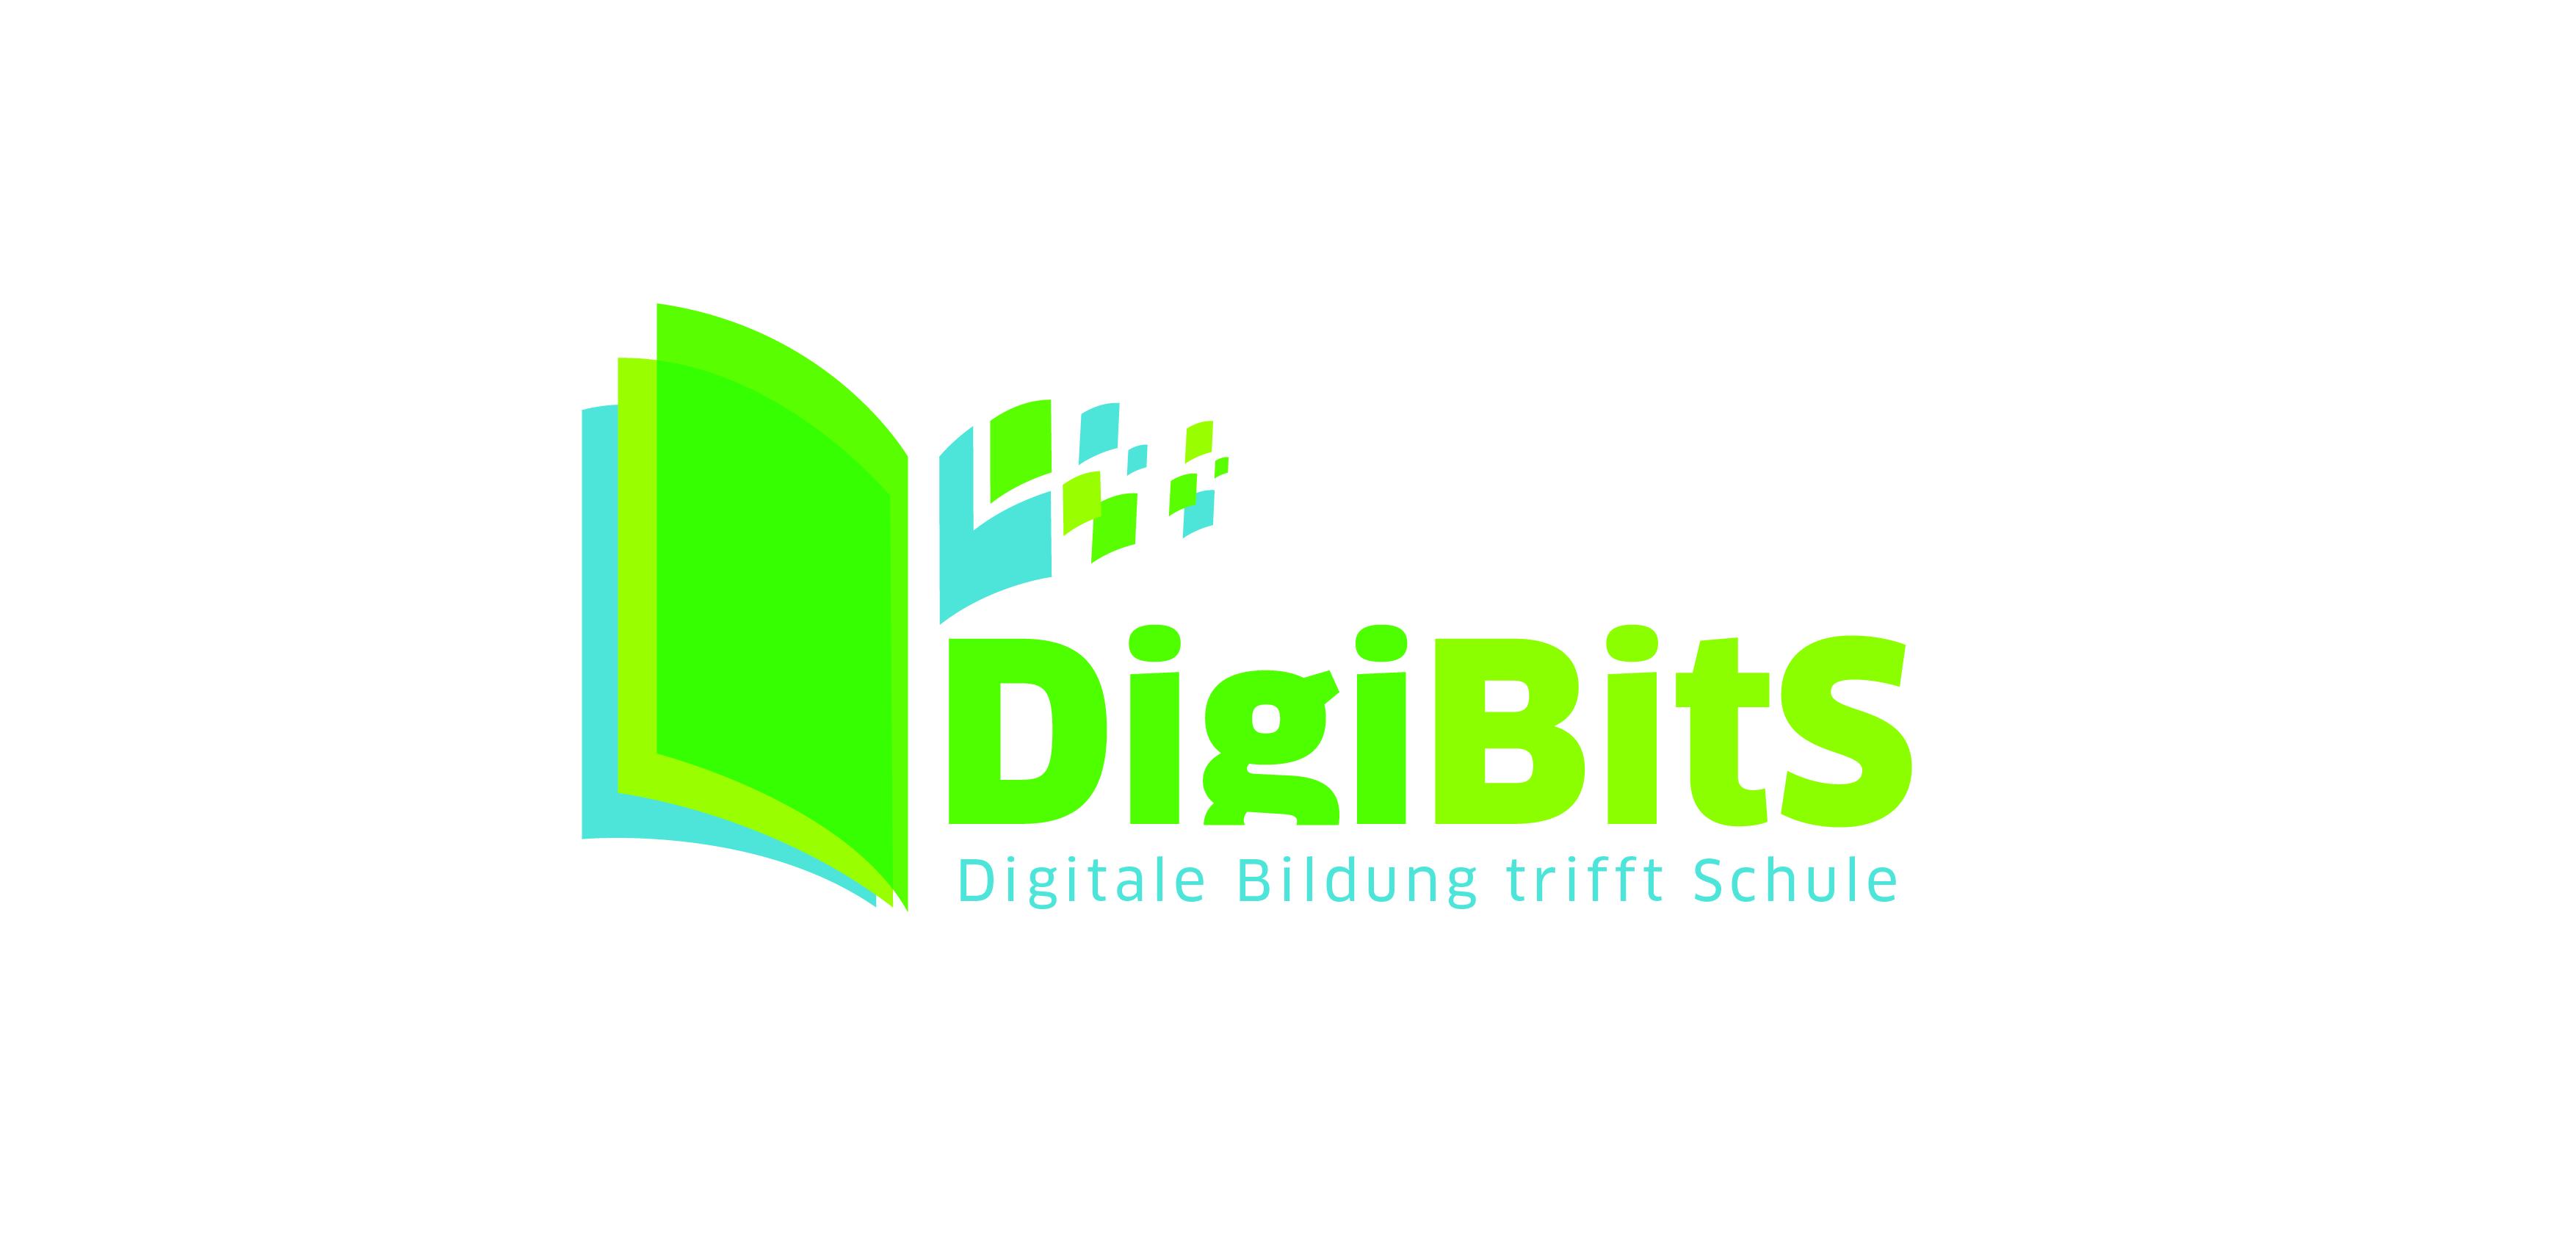 Digibits DigiBitS - Digitale Bildung trifft Schule - Digibits